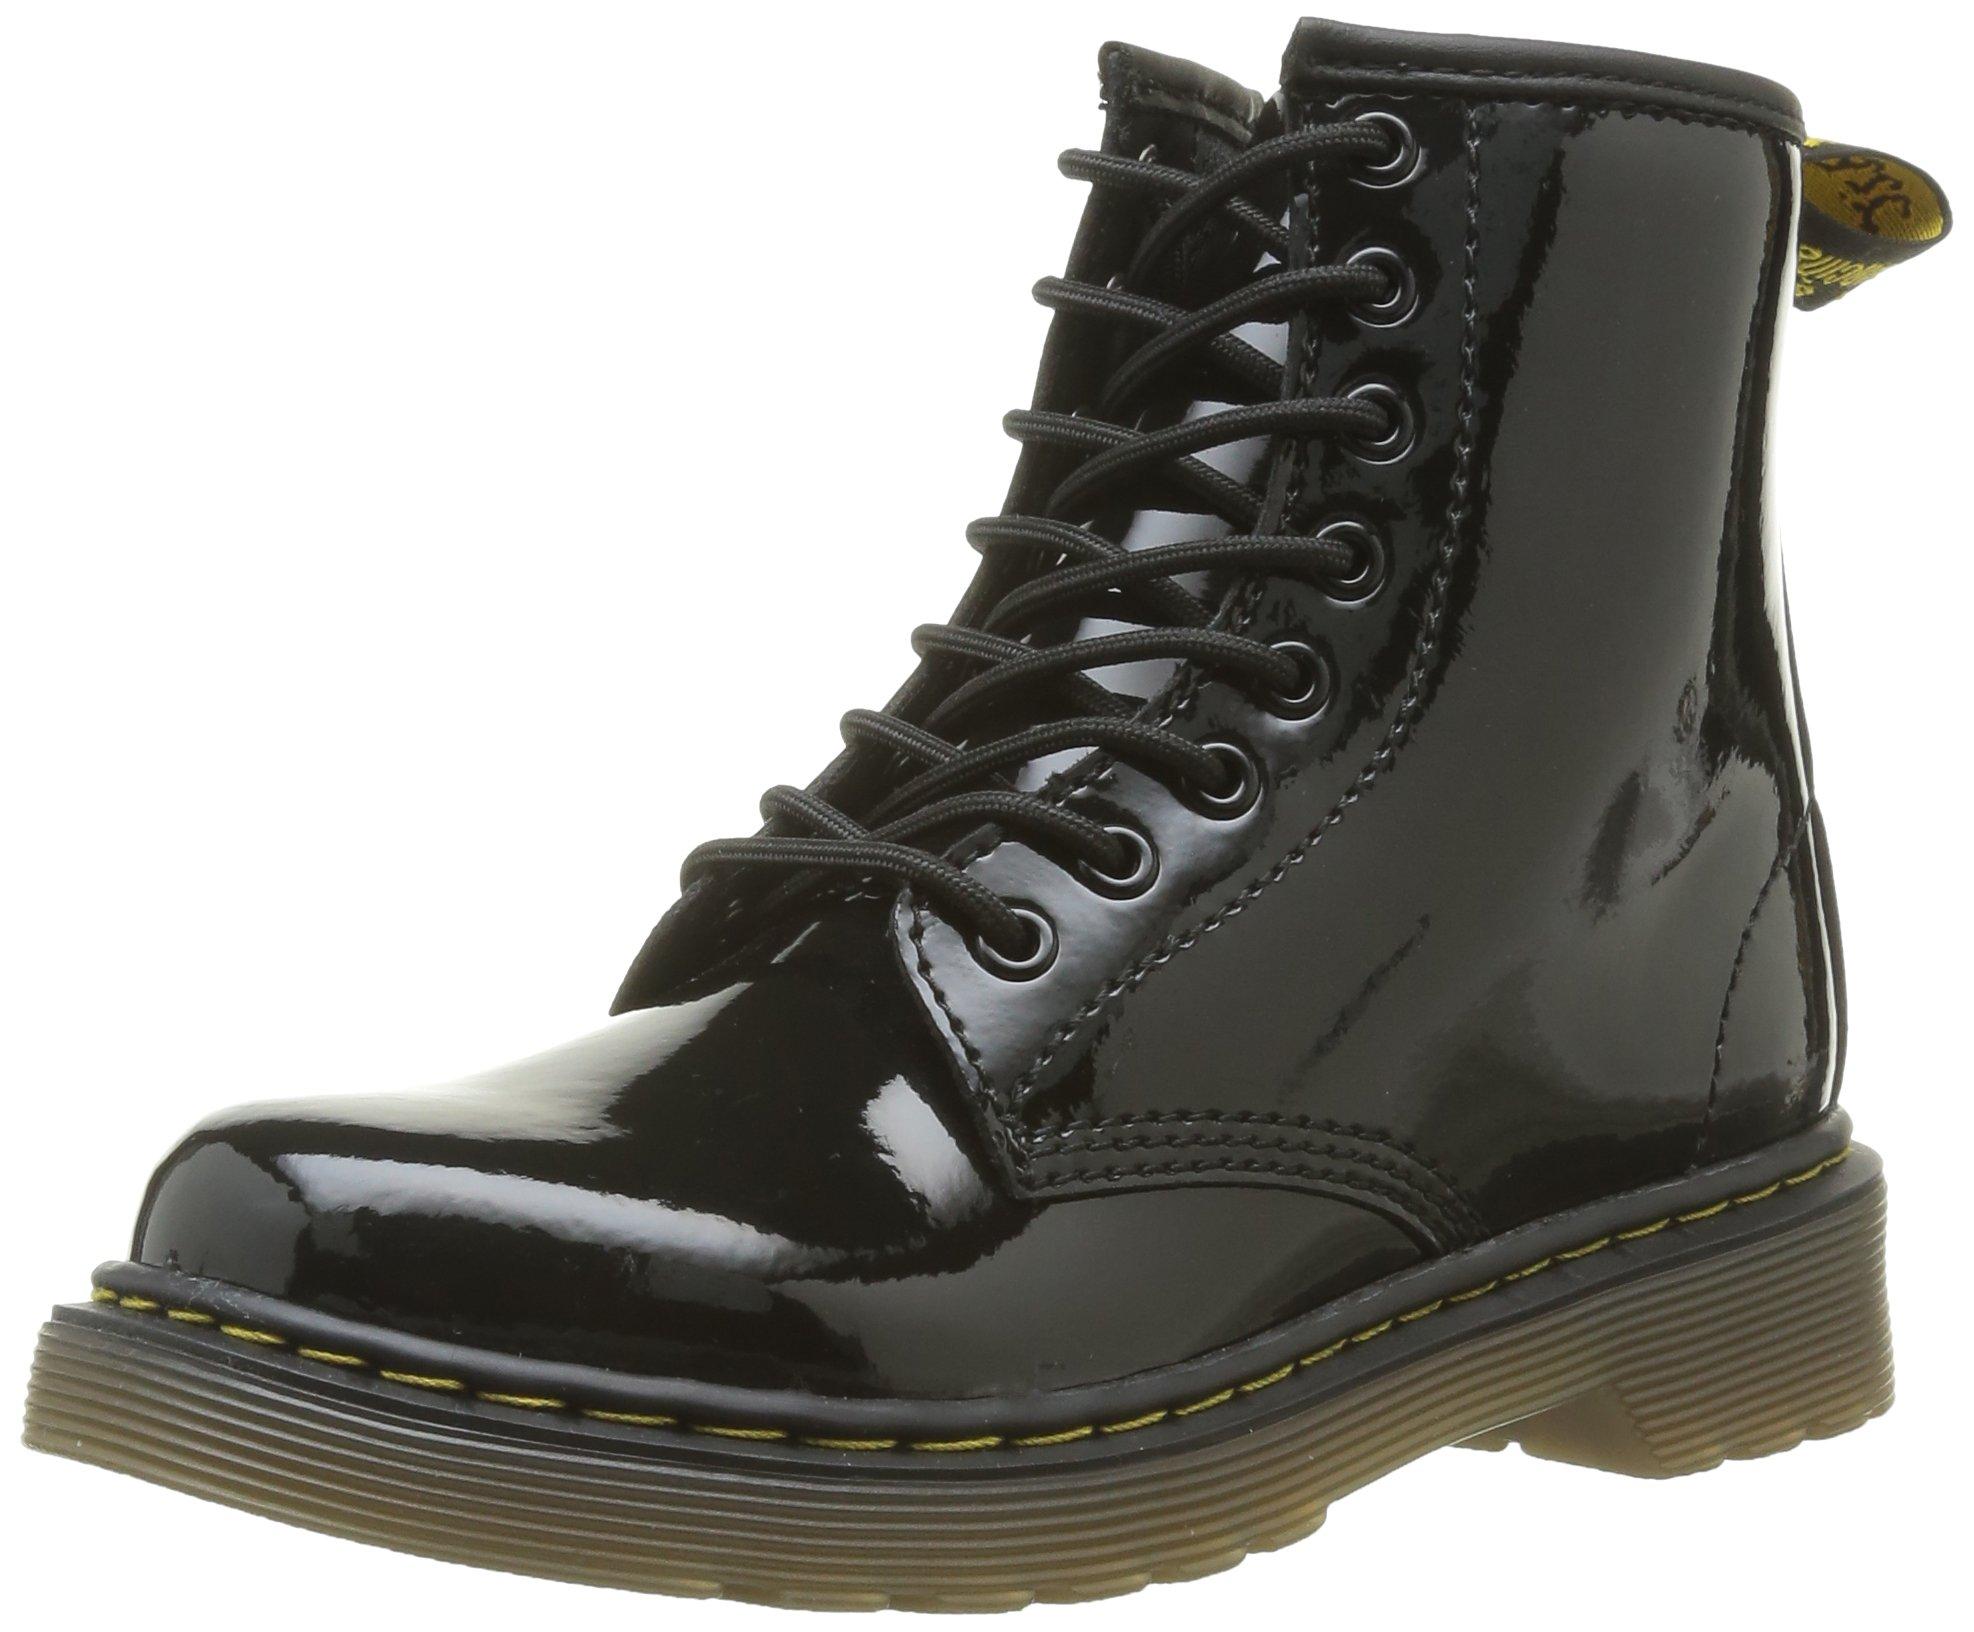 Dr Martens Kleinkinds Delaney Patent Boots - US 4.5